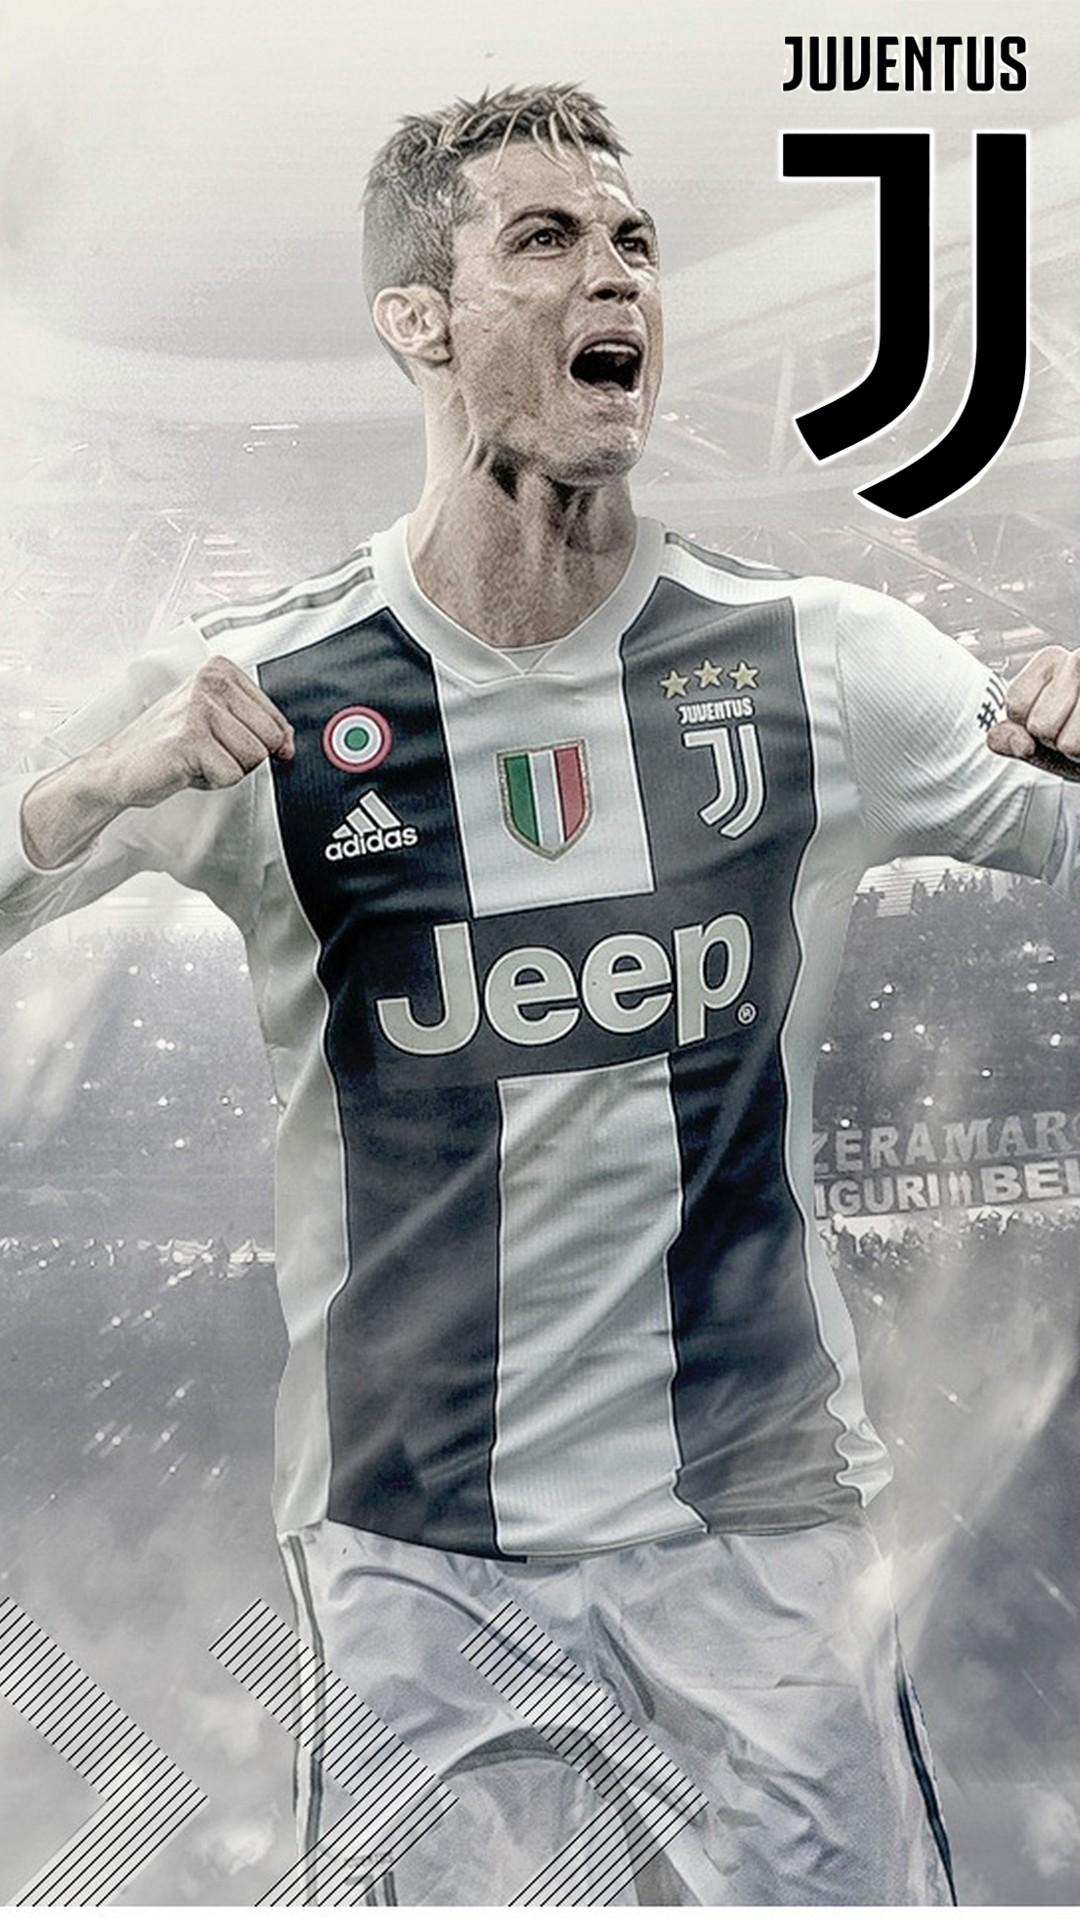 Cr7 Wallpaper Iphone X Cr7 Juventus Iphone 8 Wallpaper 2019 Football Wallpaper